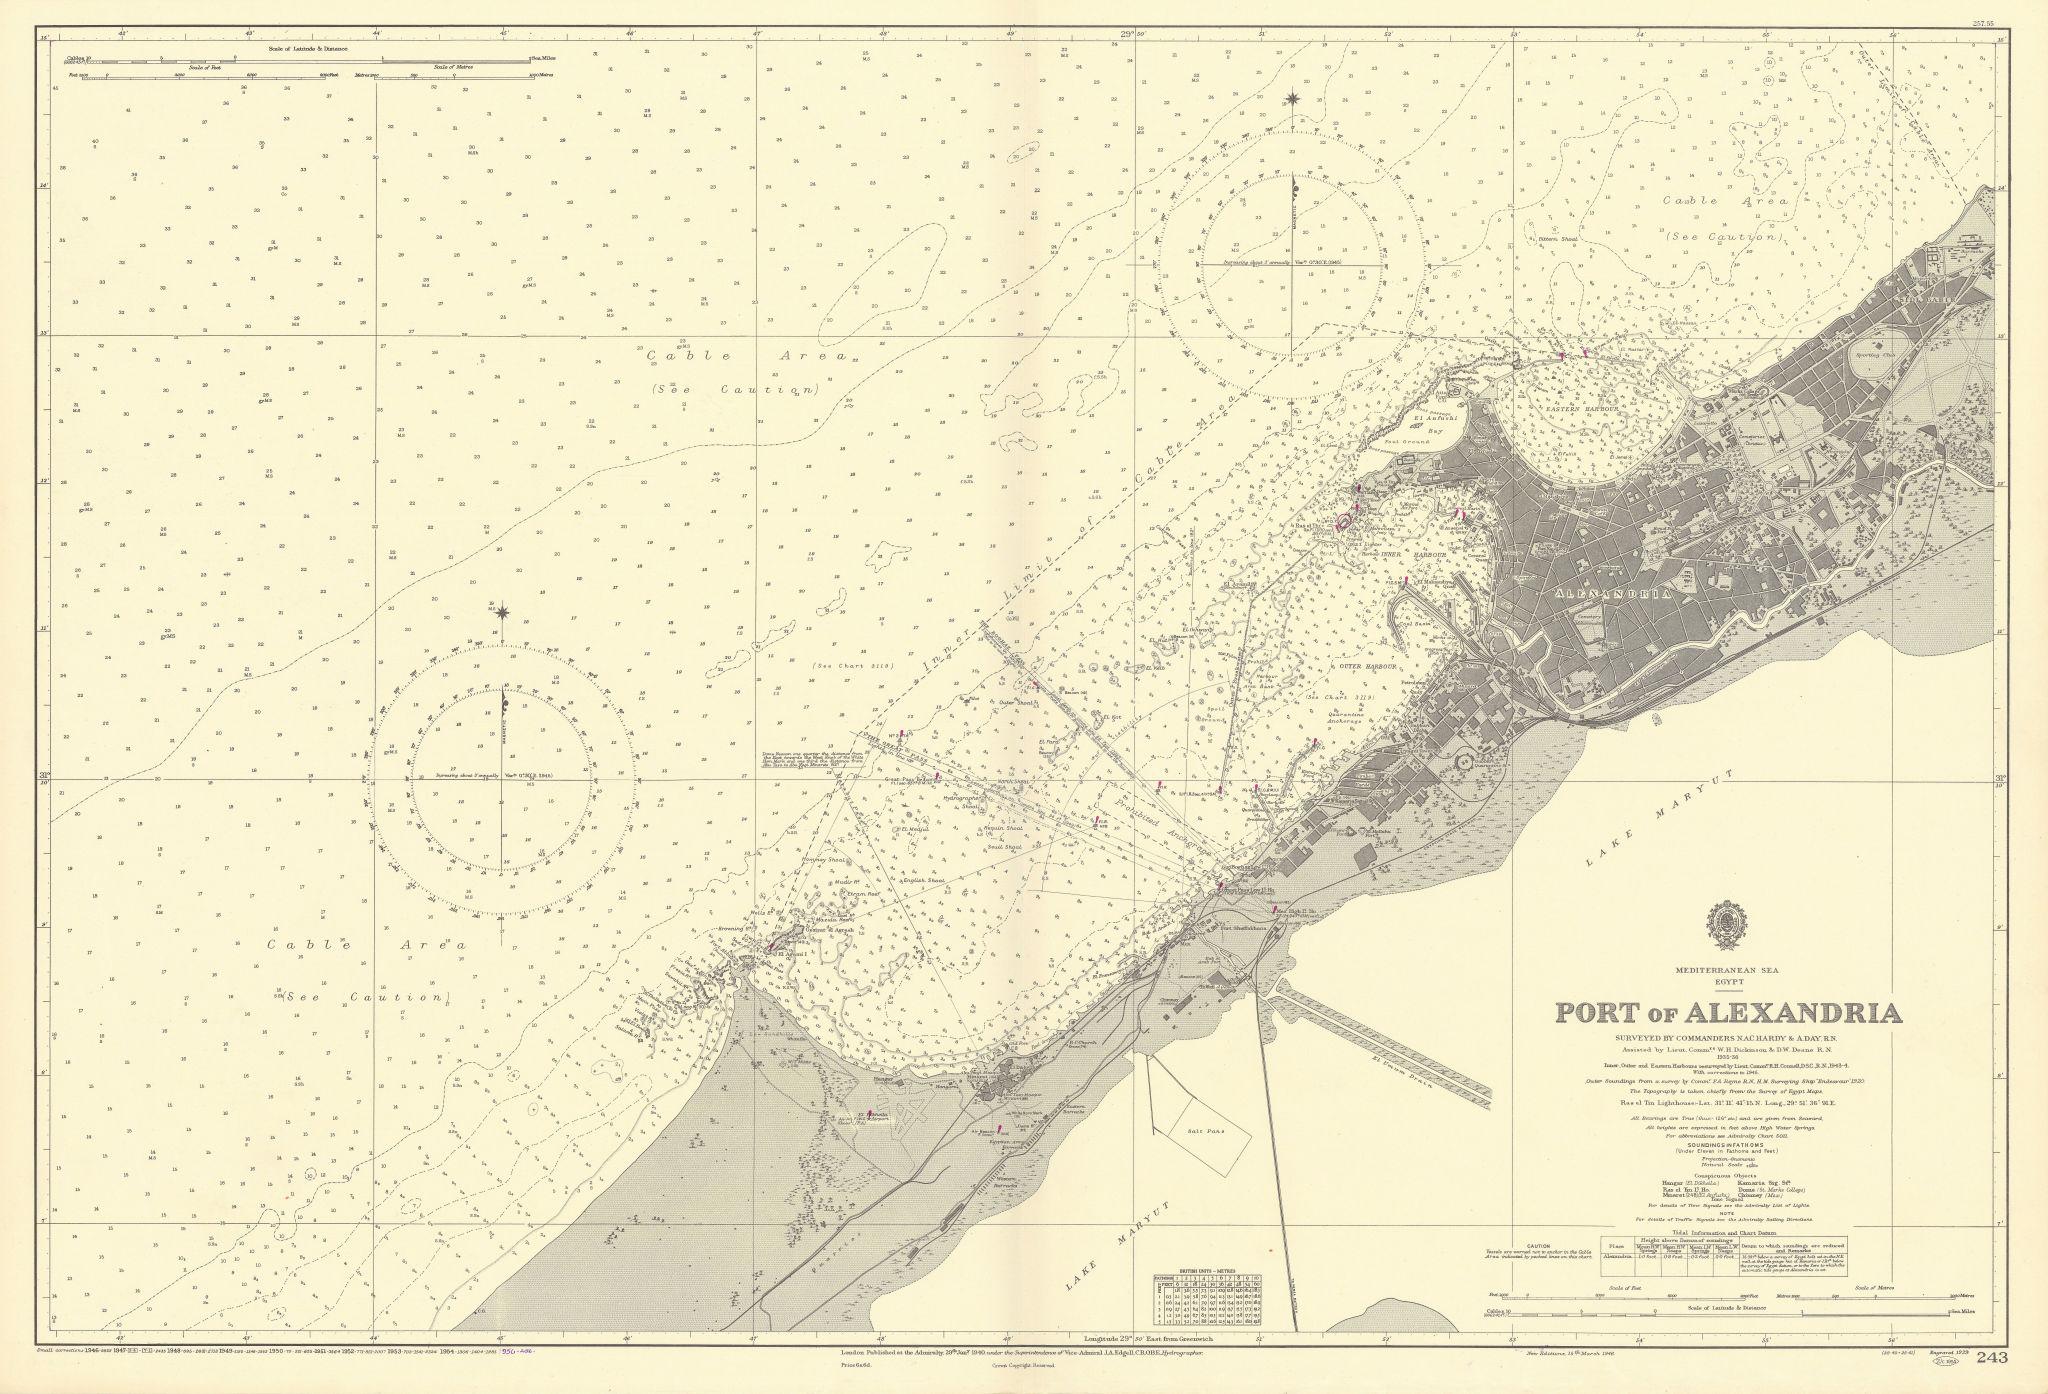 Port of Alexandria, Egypt. Mediterranean. ADMIRALTY sea chart 1940 (1956) map